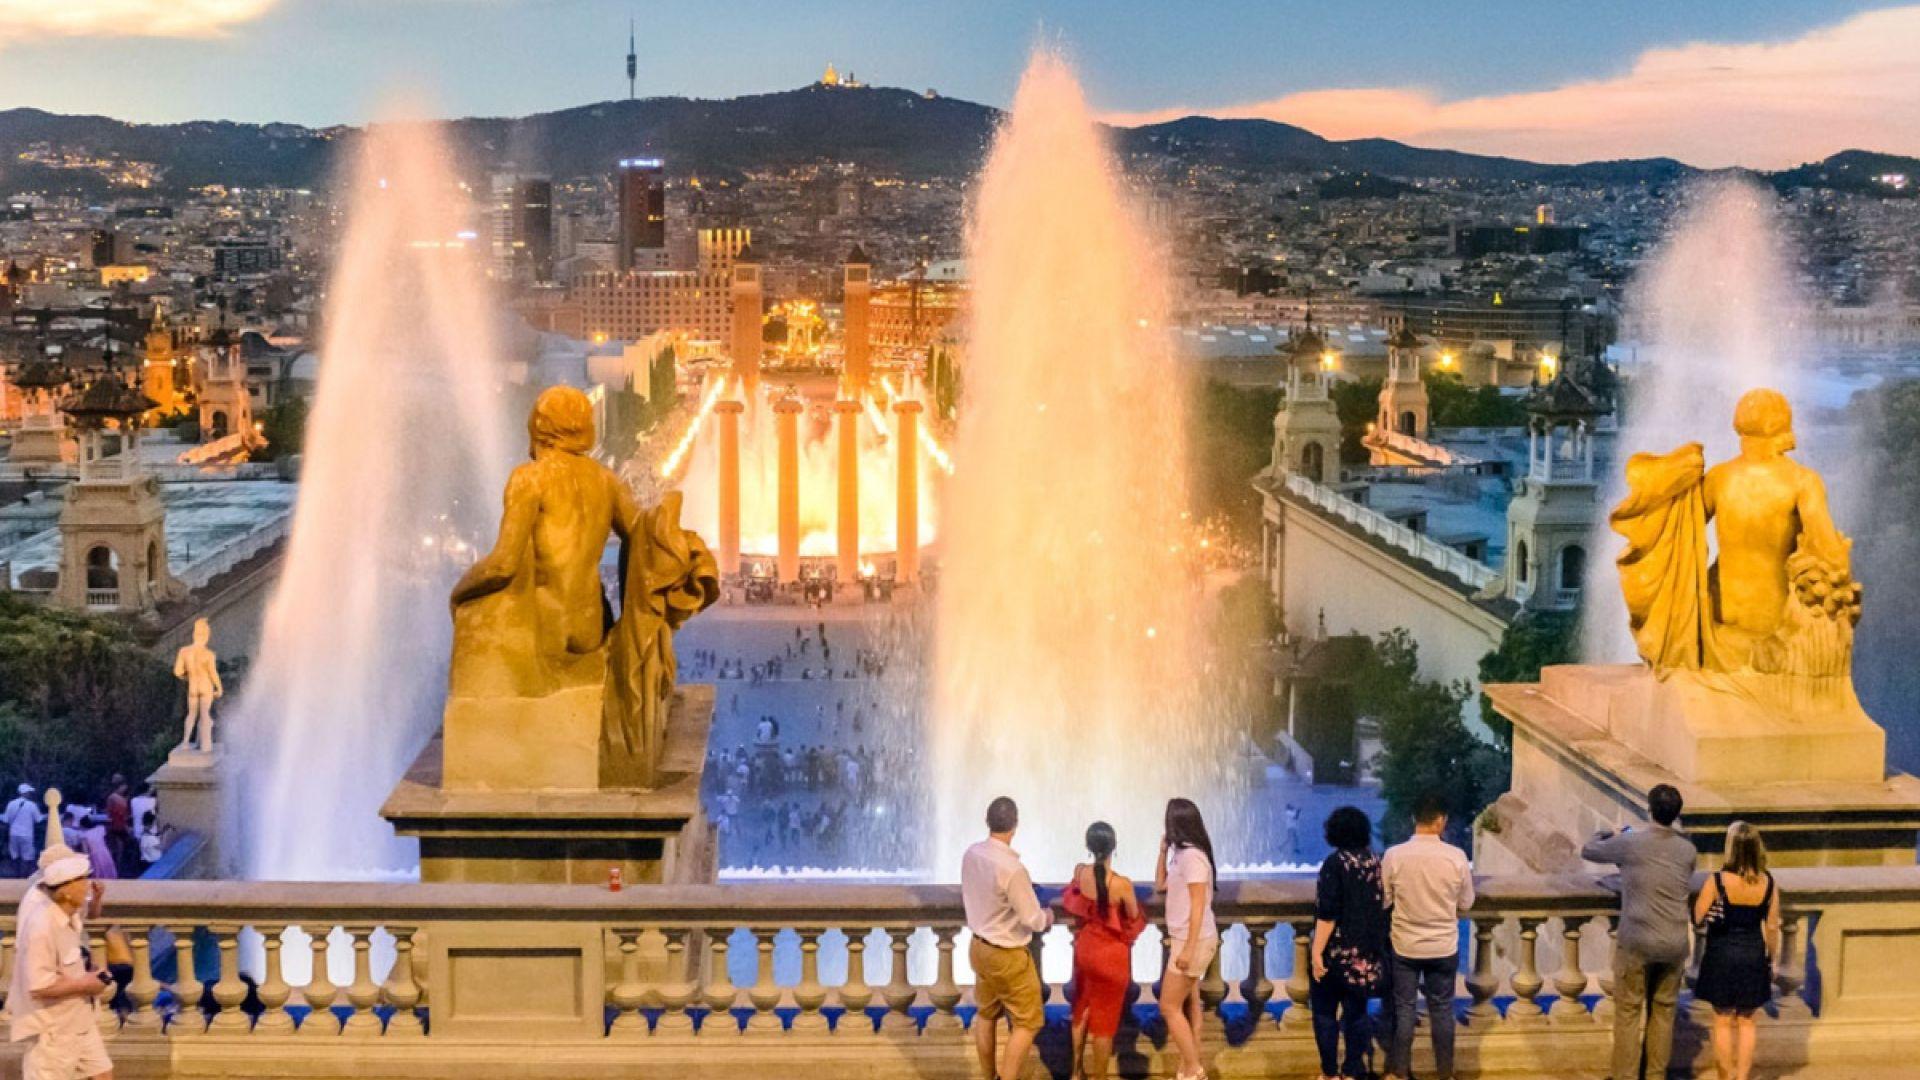 https://www.aparthotelsenator.com/resources/img/imgTxt/aparthotel-senator-barcelona-hotel-hotel-inferior-nova-web-4_25_108_1063.jpg